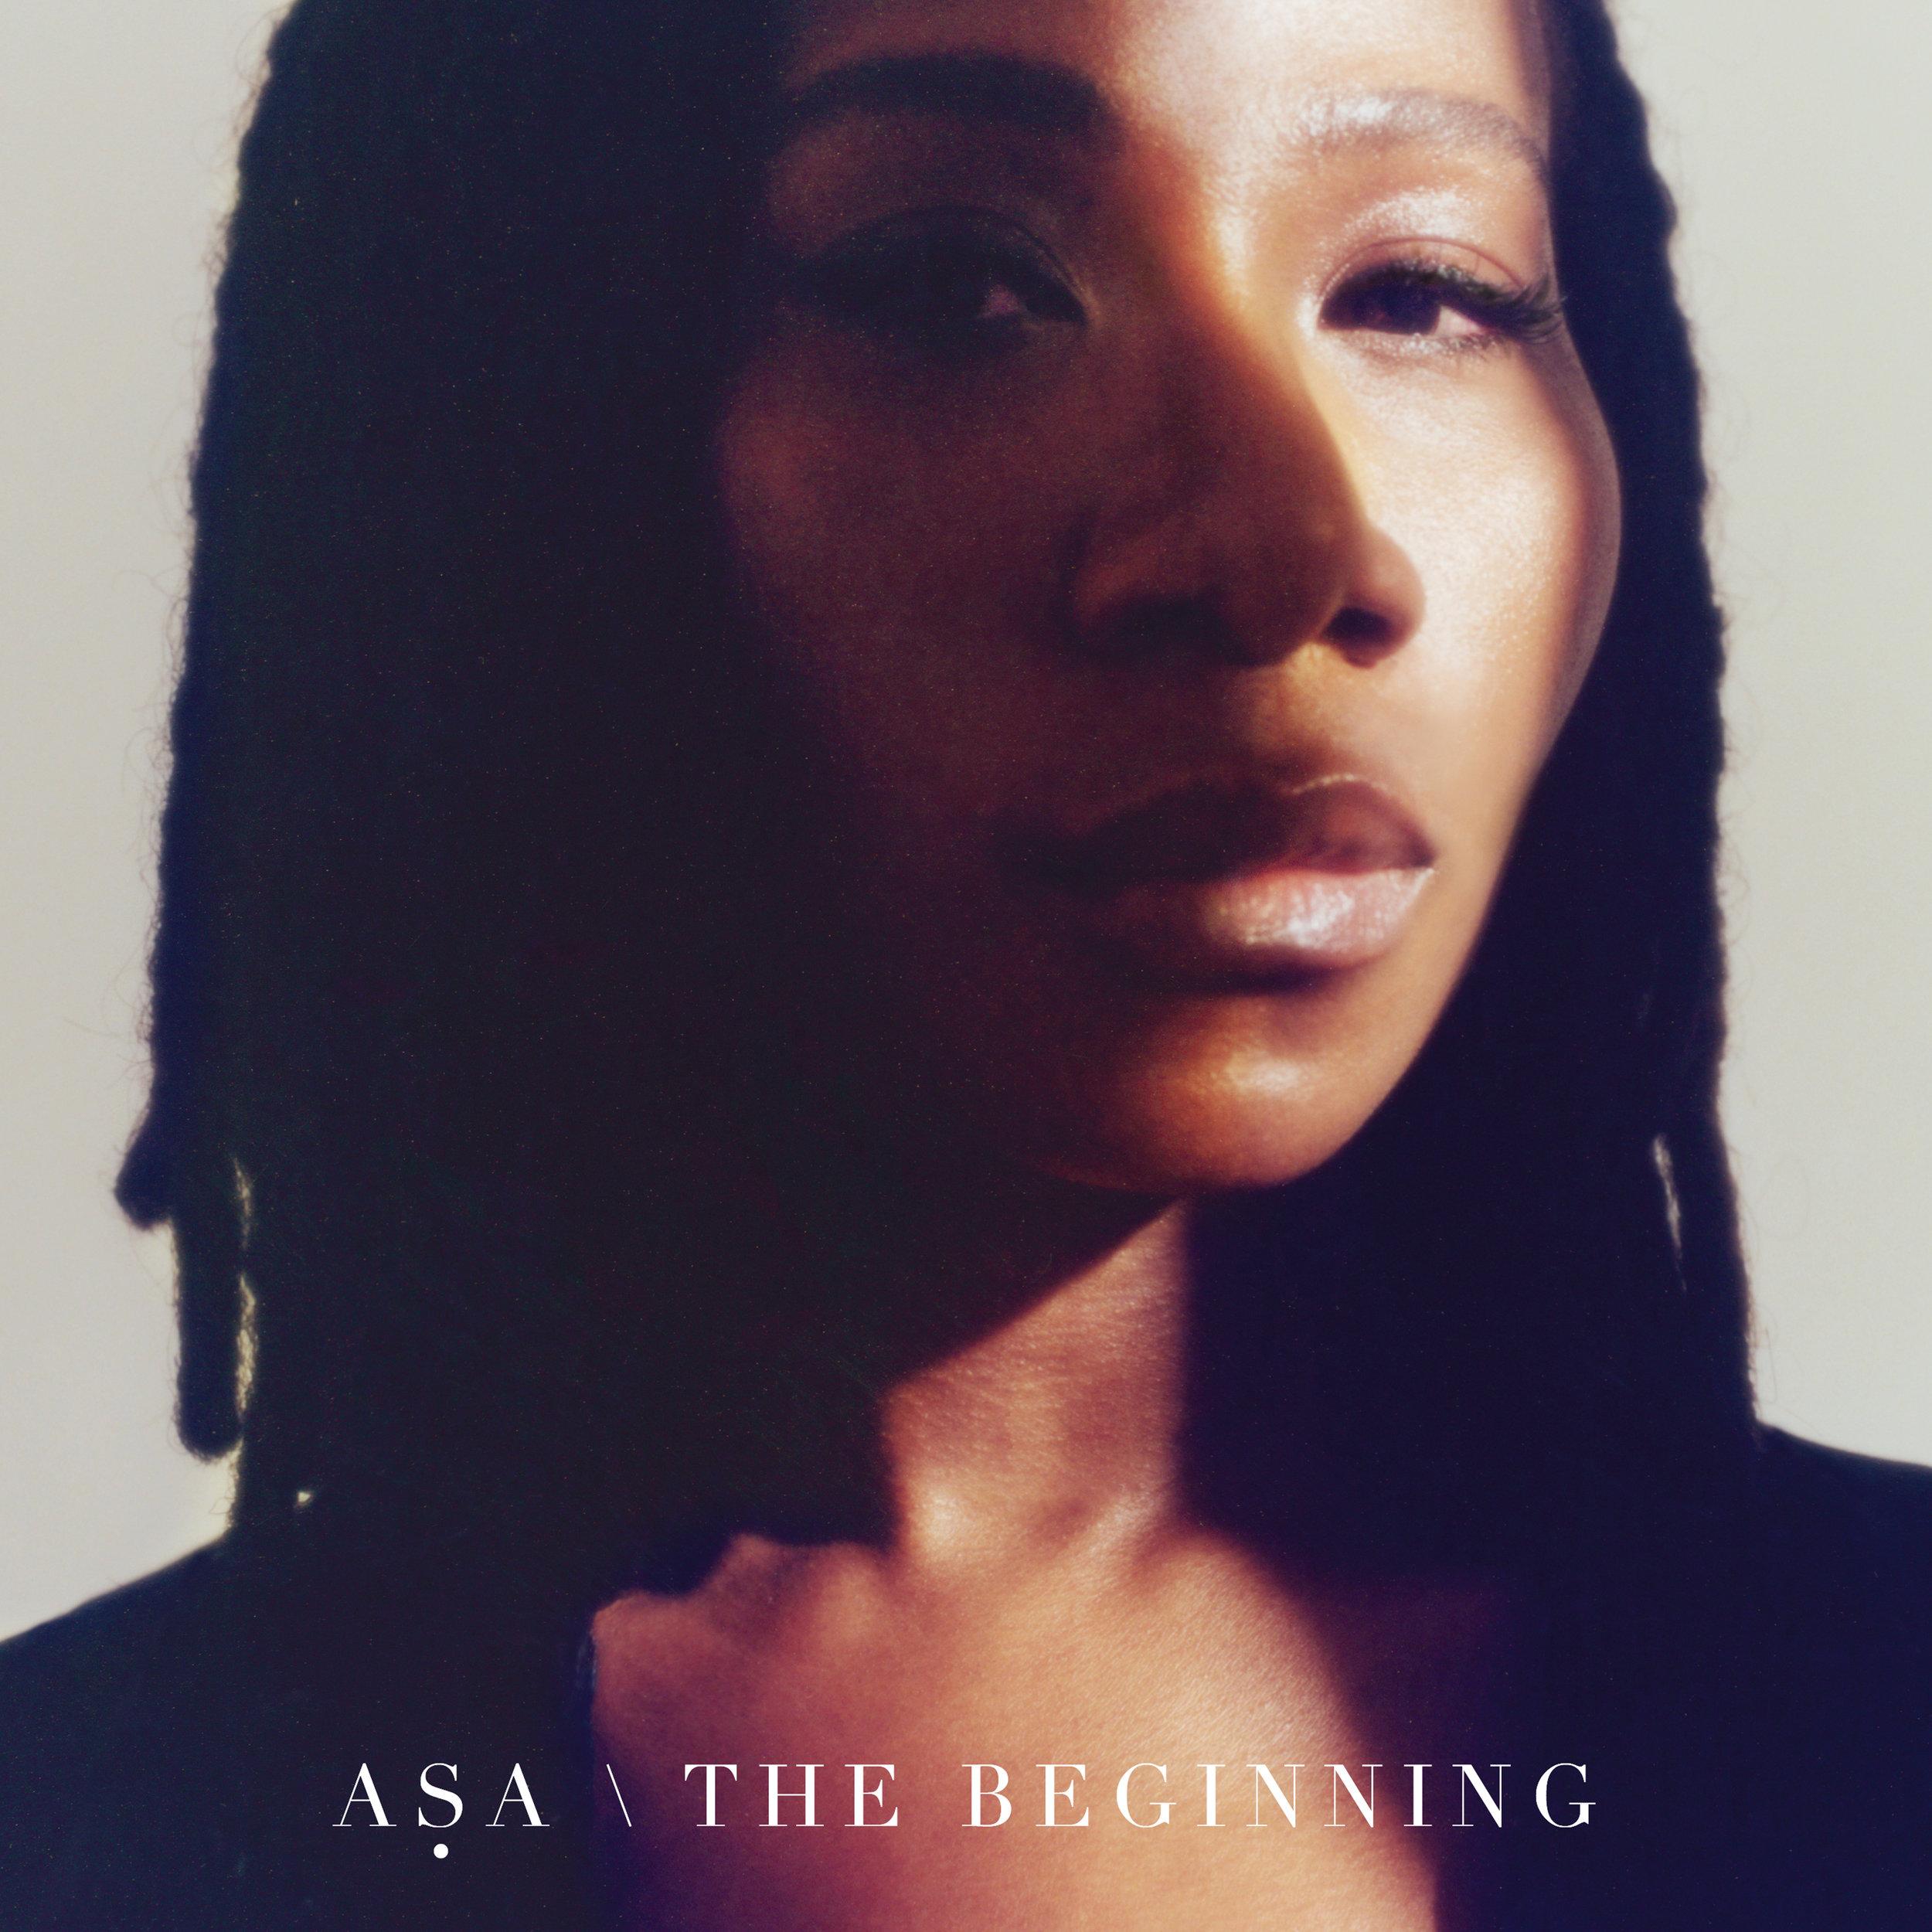 SHA-2859 Asa--The Beginning SINGLE.jpg